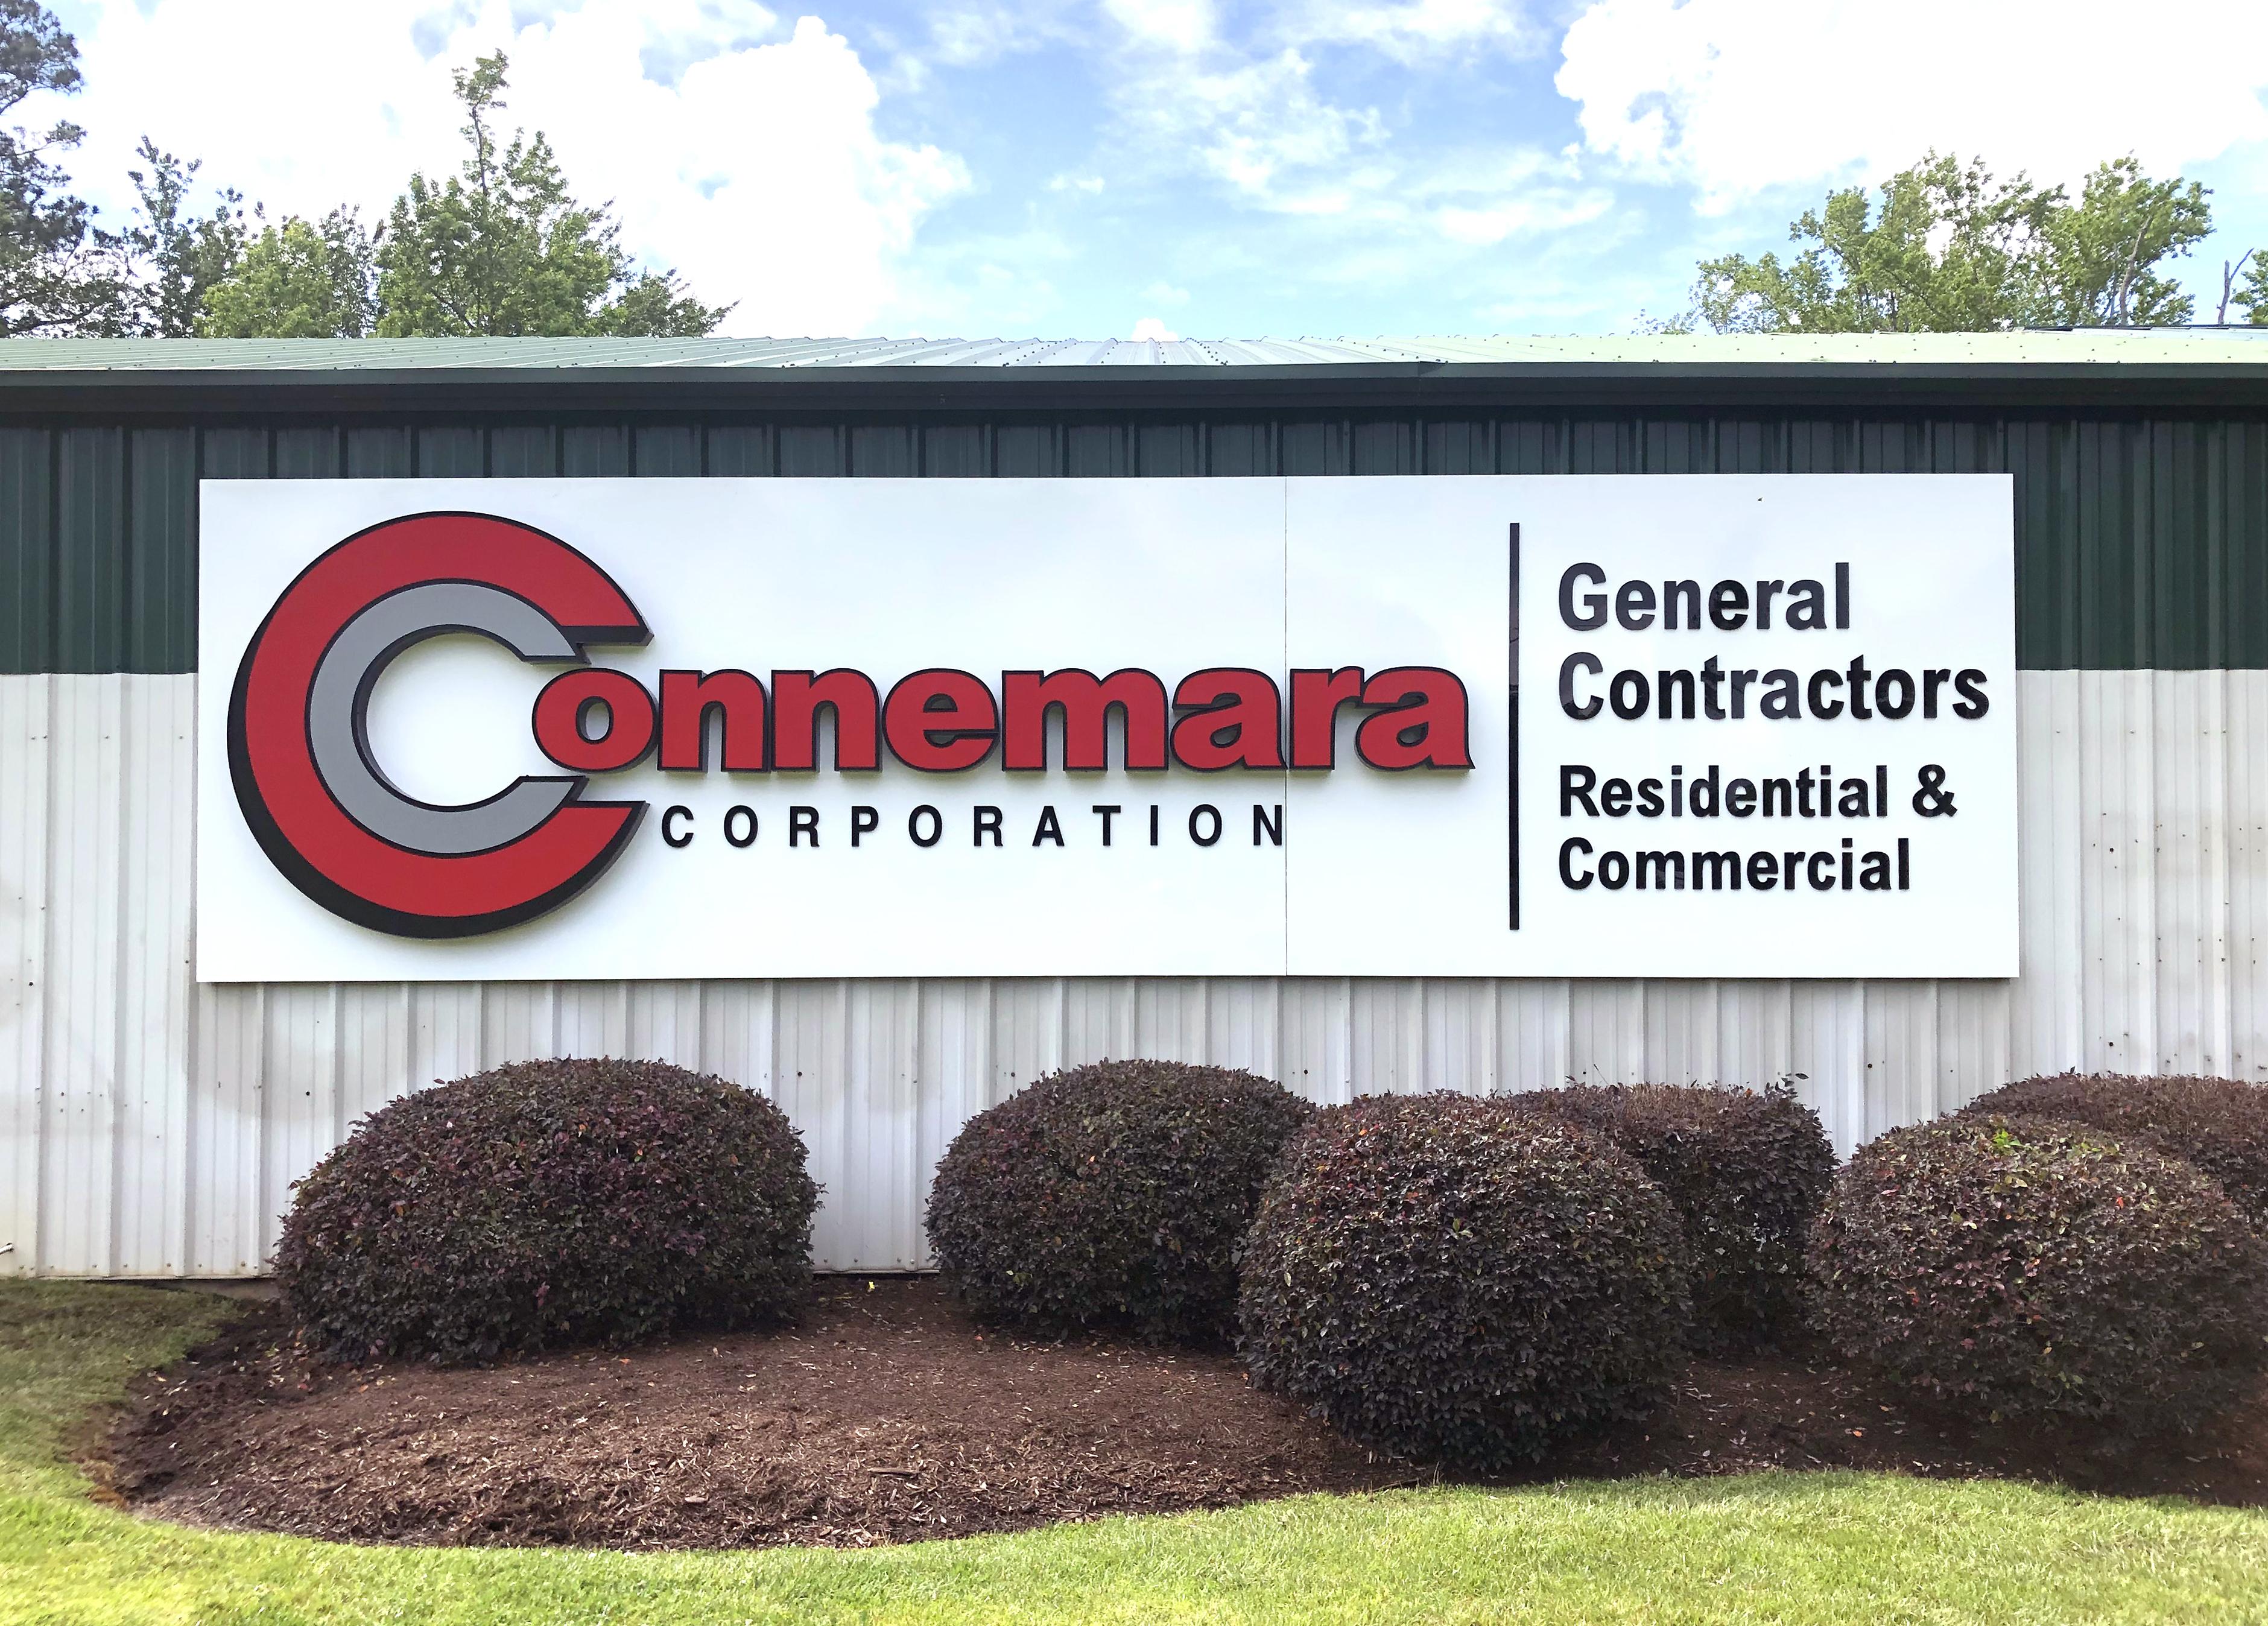 Connemara Corporation